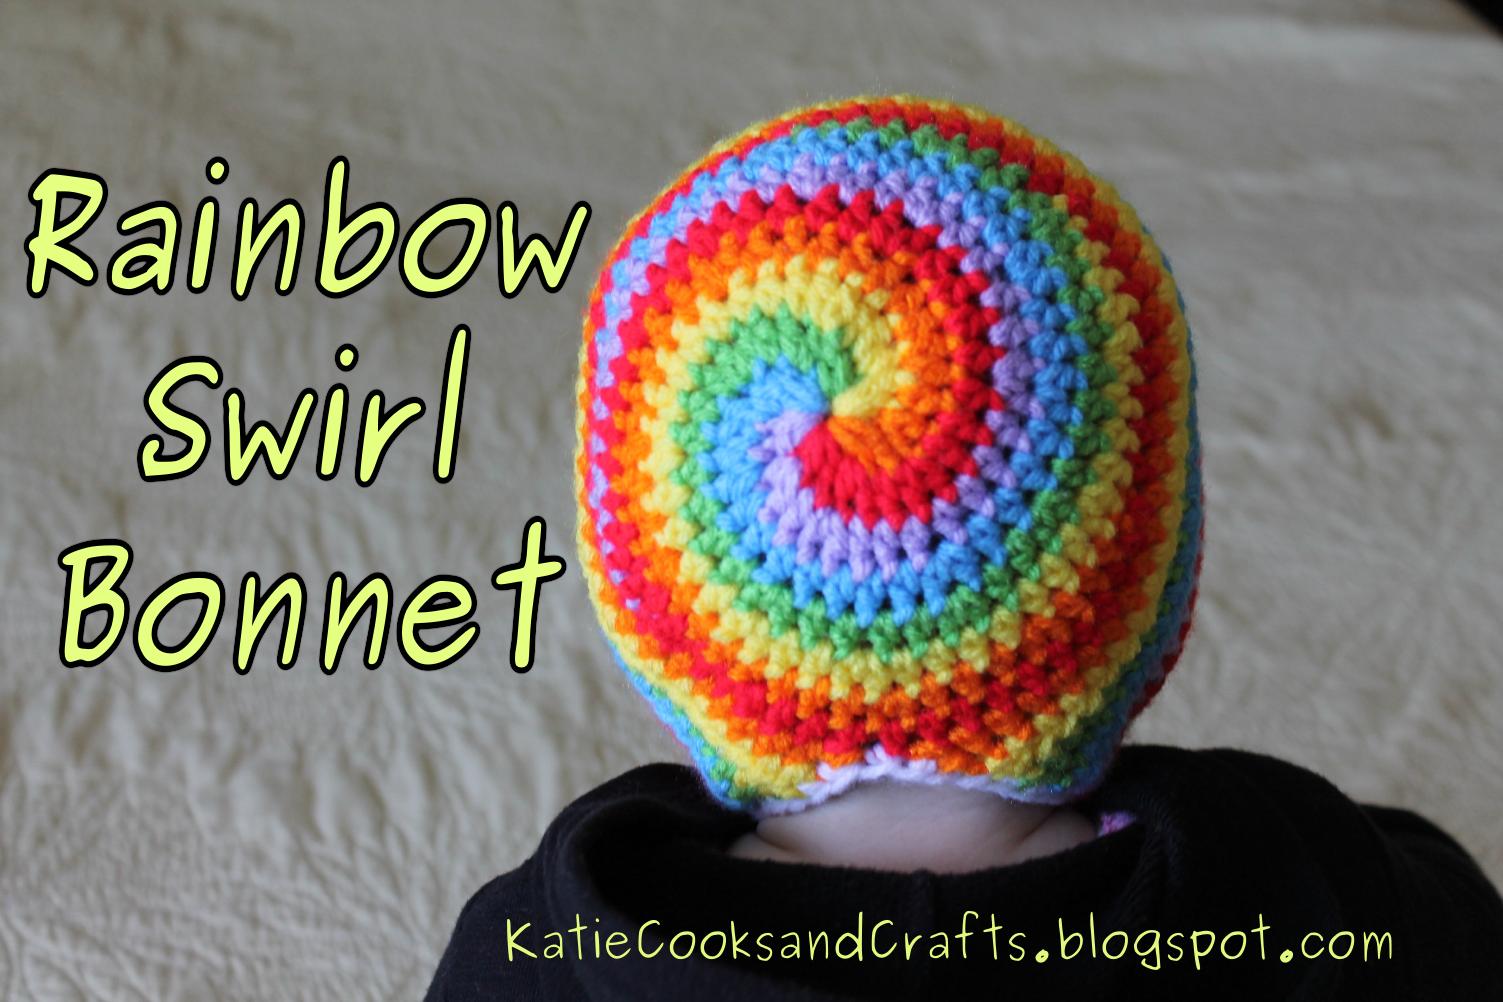 Katie Cooks and Crafts: Rainbow Swirl Bonnet. ☀CQ #crochet #apparel ...